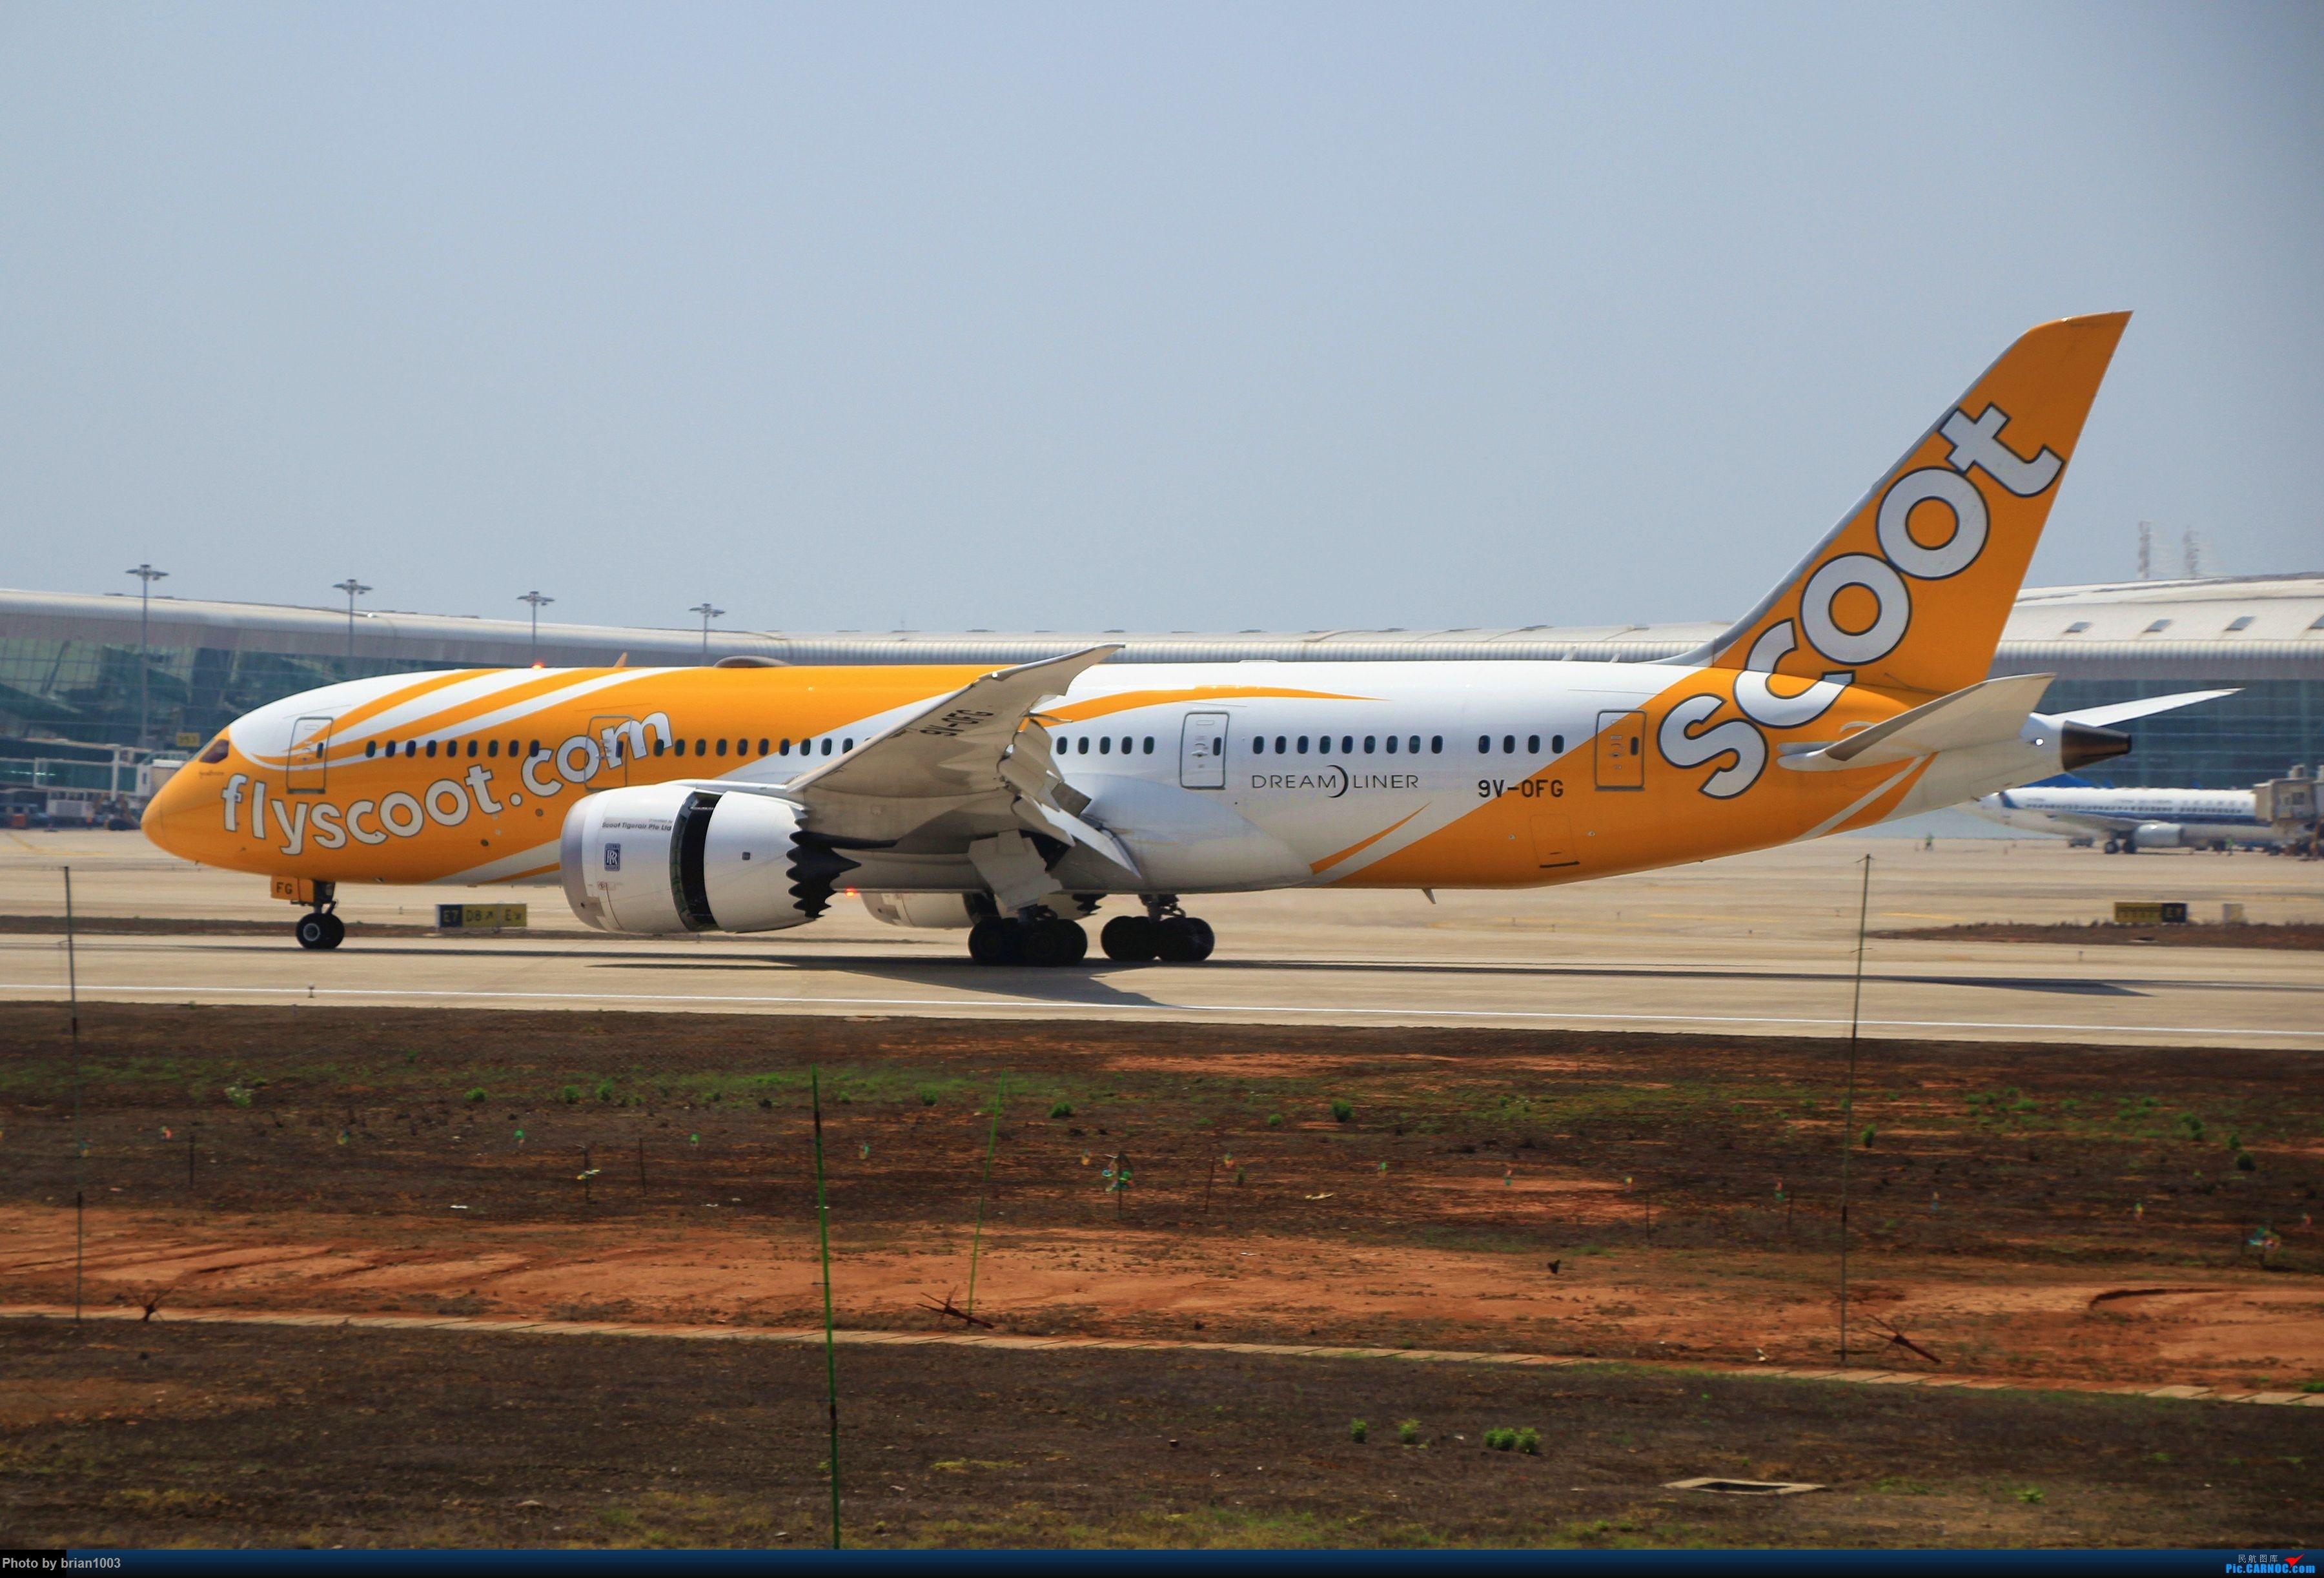 Re:[原创]WUH武汉天河机场拍机之喜迎酷航788和偶遇某其他飞机 BOEING 787-8 9V-OFG